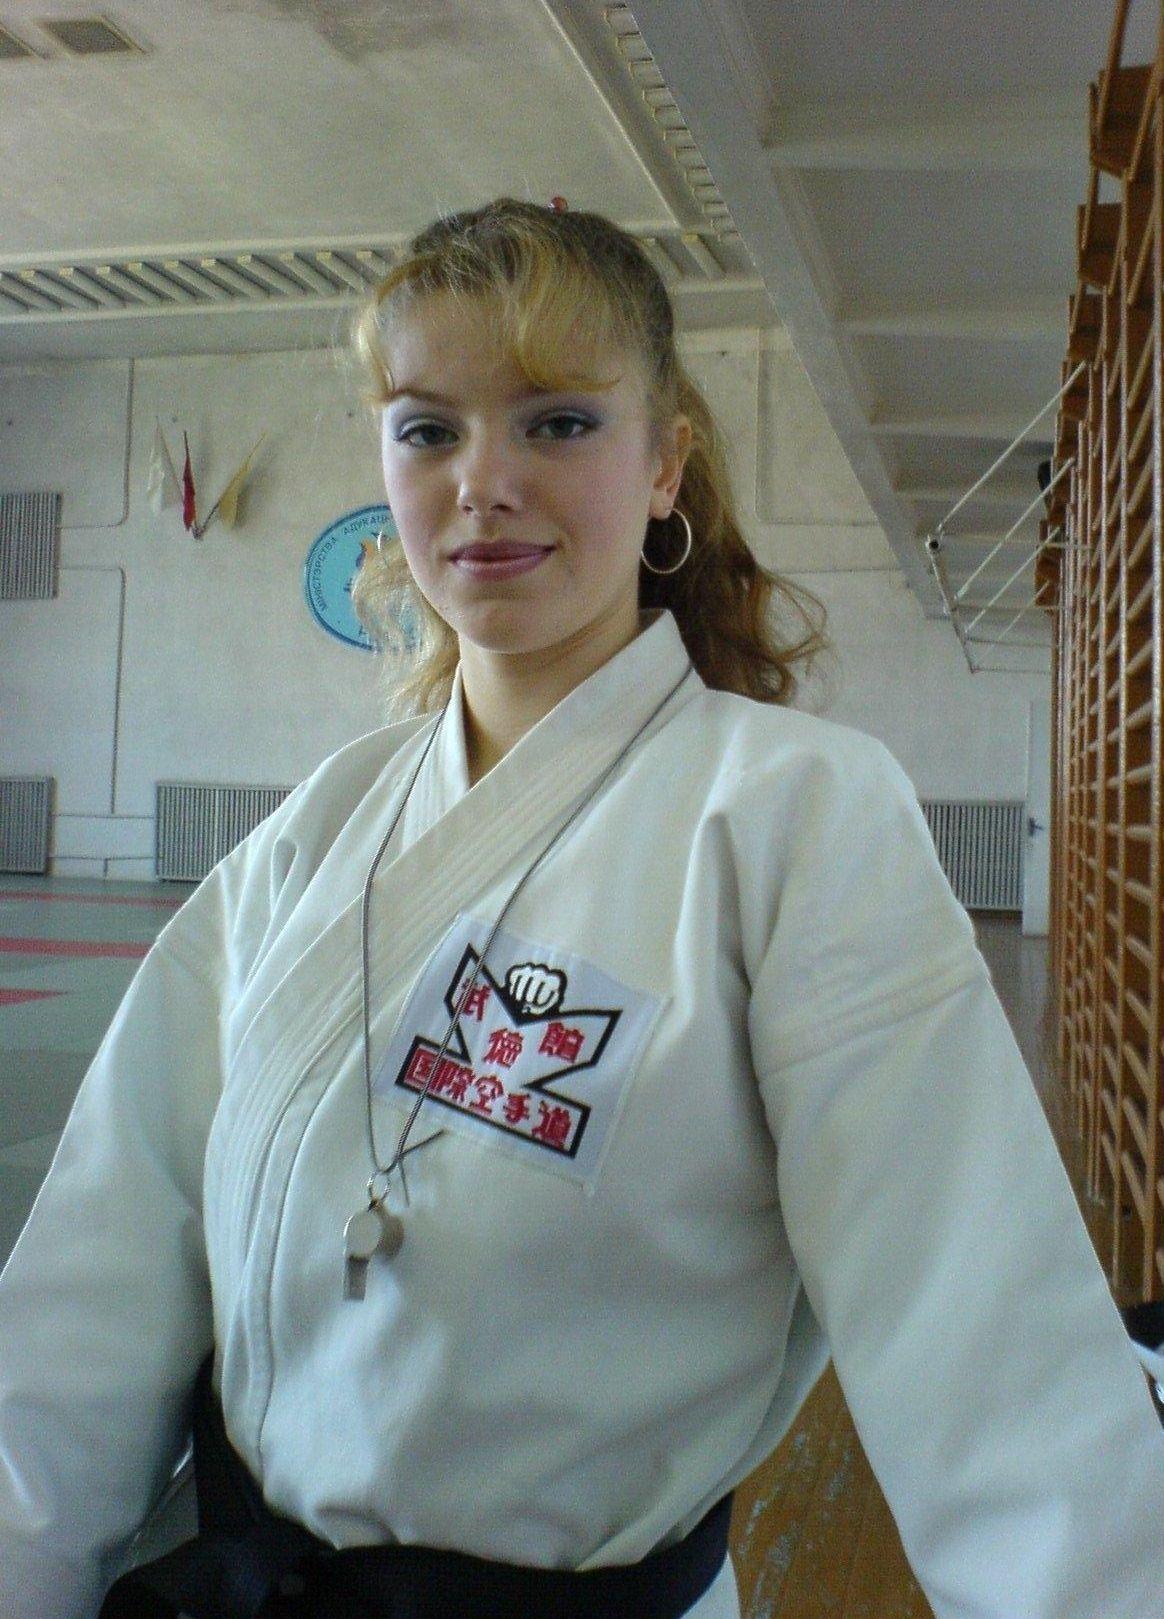 https://i0.wp.com/upload.wikimedia.org/wikipedia/commons/1/17/Liudmila_Andreevna_VEDERNIKOVA.jpg